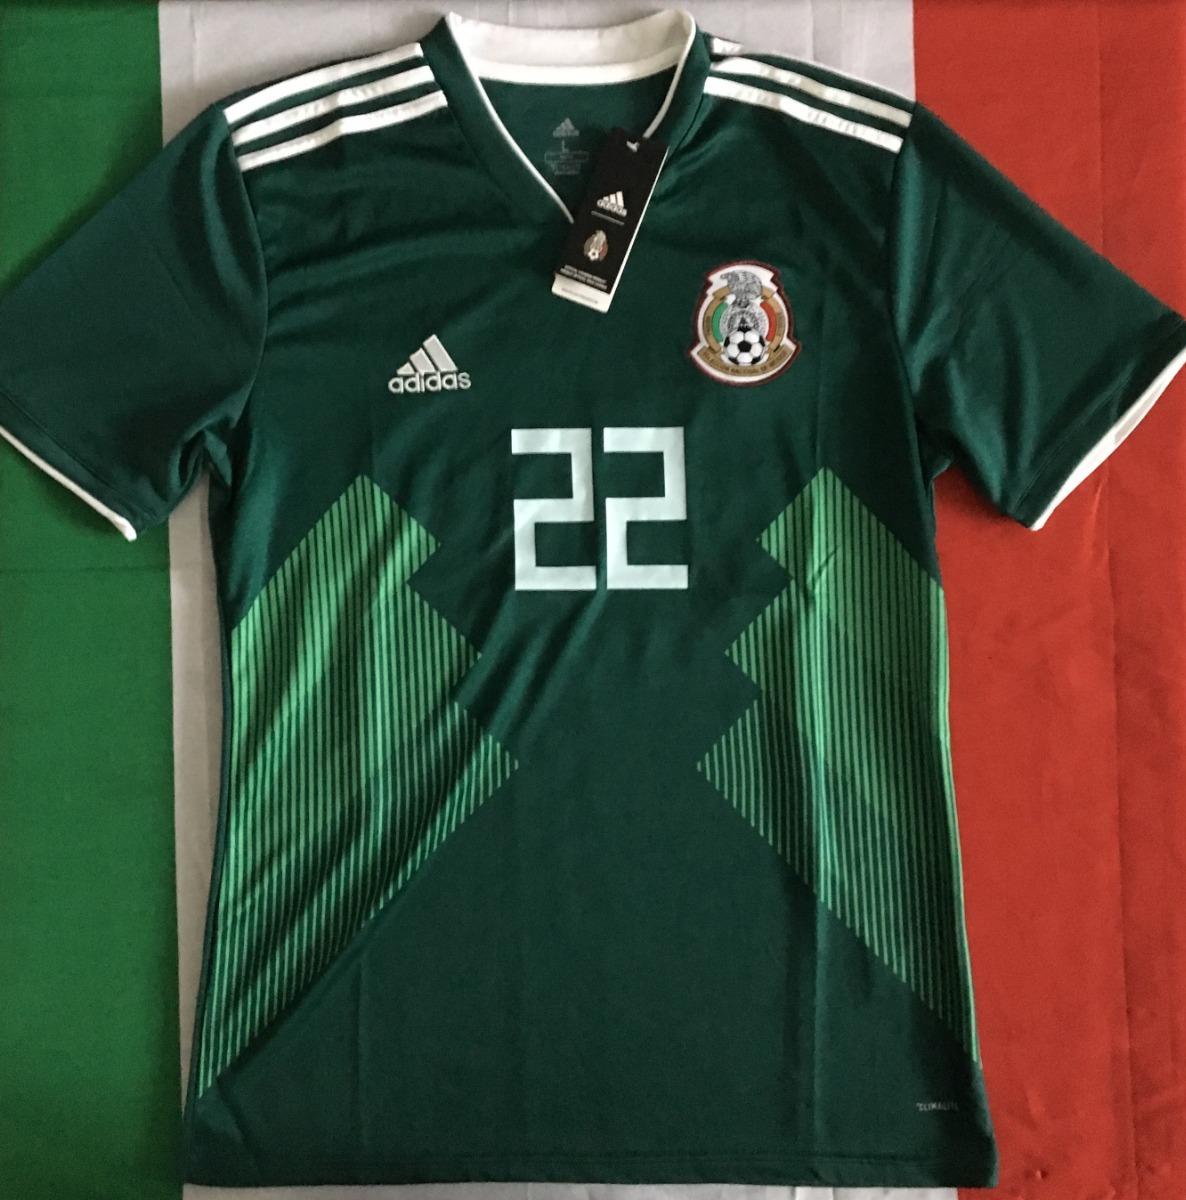 7b4e53674 increible jersey mexico mundial 2018 verde hirving lozano 22. Cargando zoom.